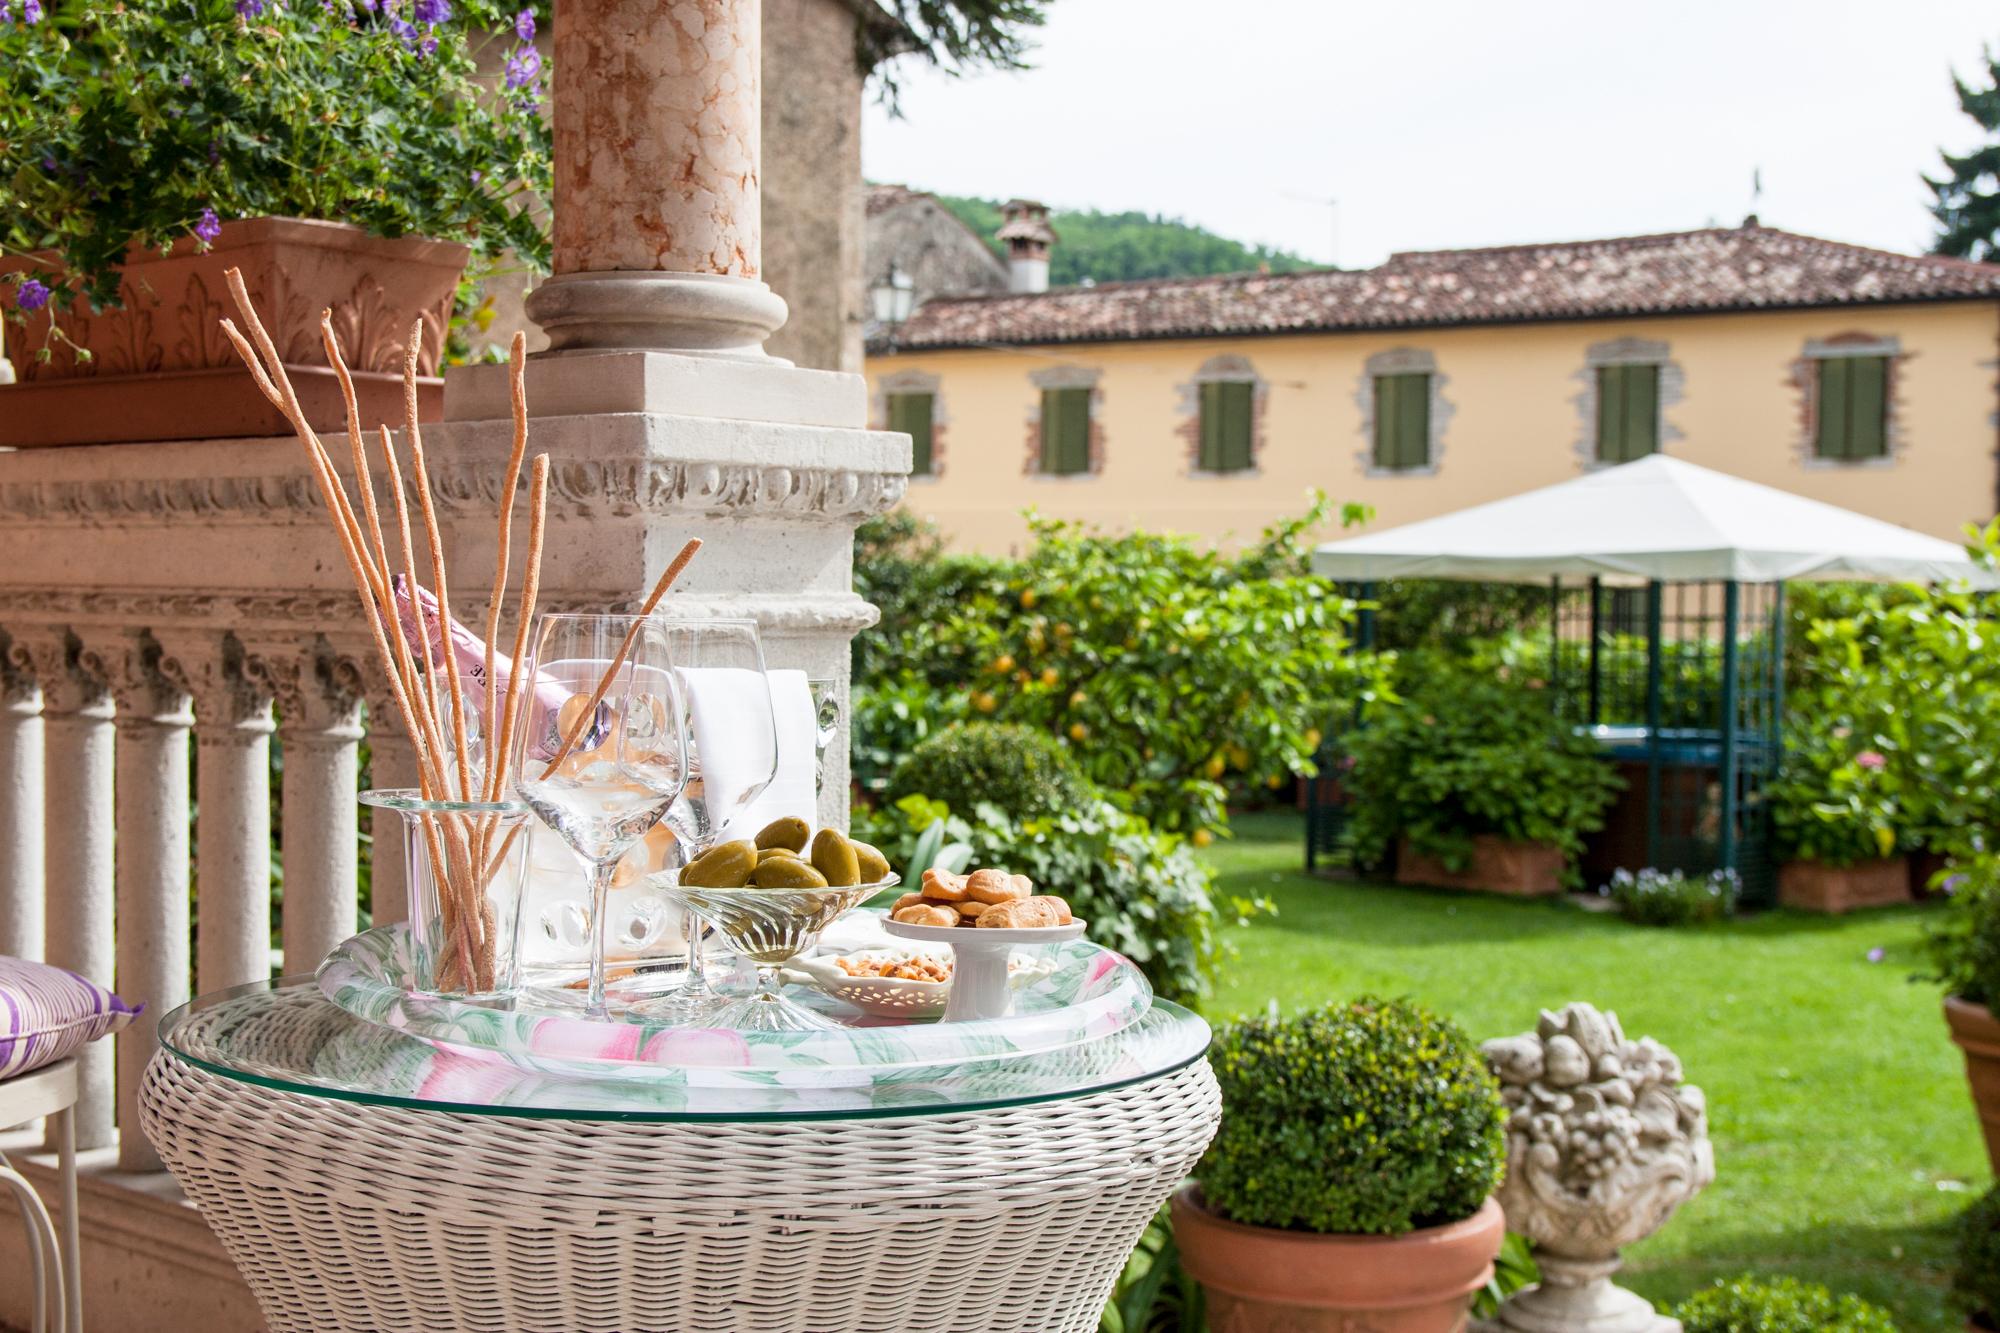 Villa Abbazia in Follina im Valdobbiadene/Veneto